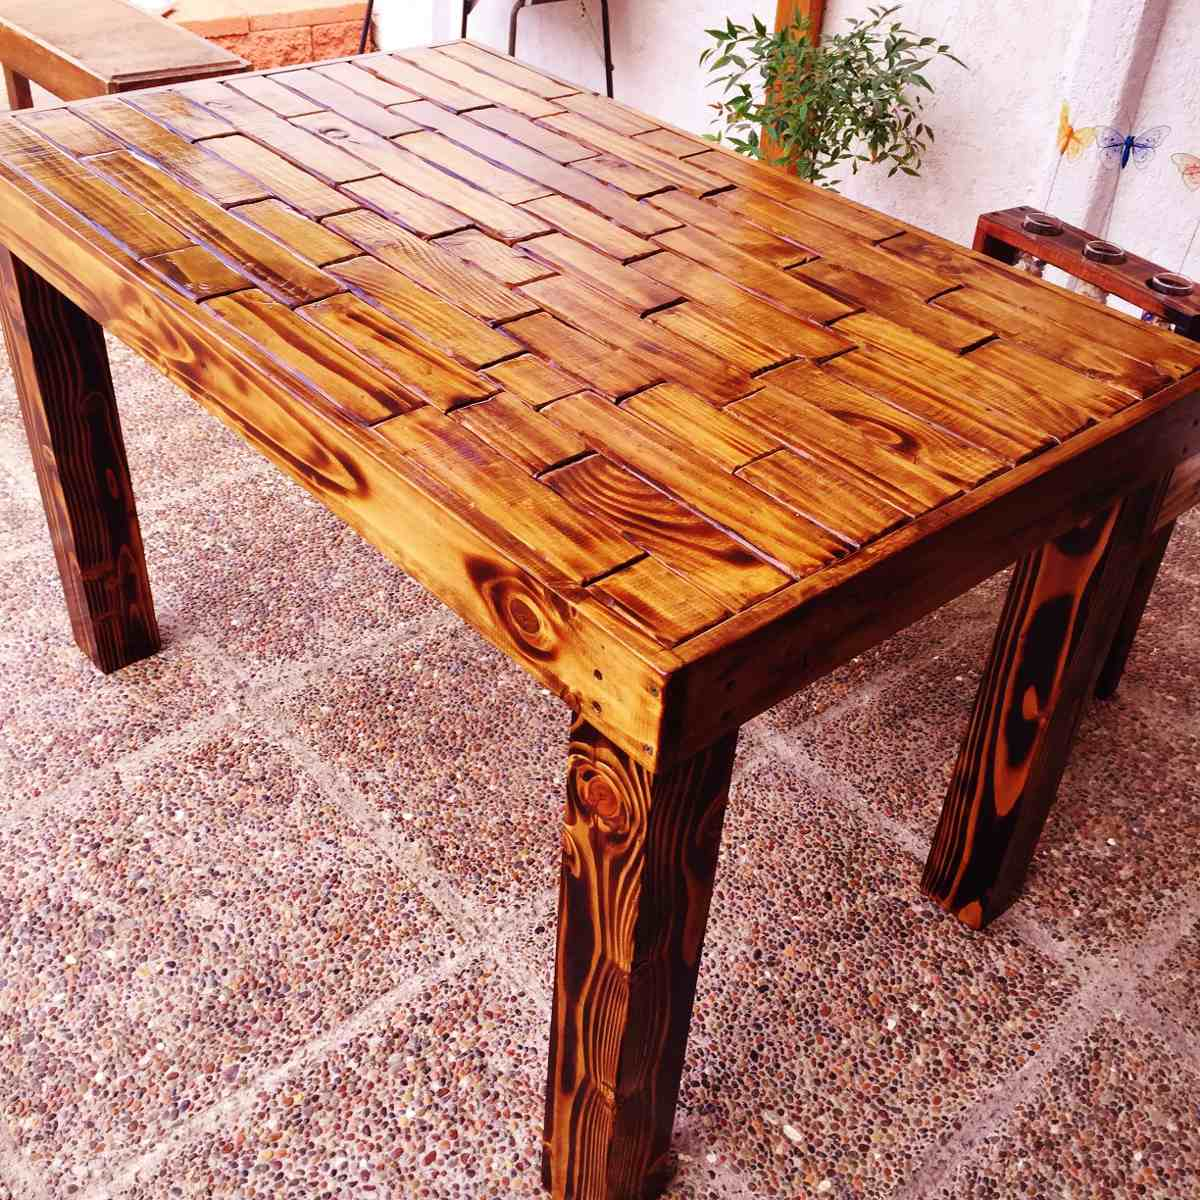 Mesa de madera rustica 150x80x75 en mercado libre for Mesas esquineras de madera